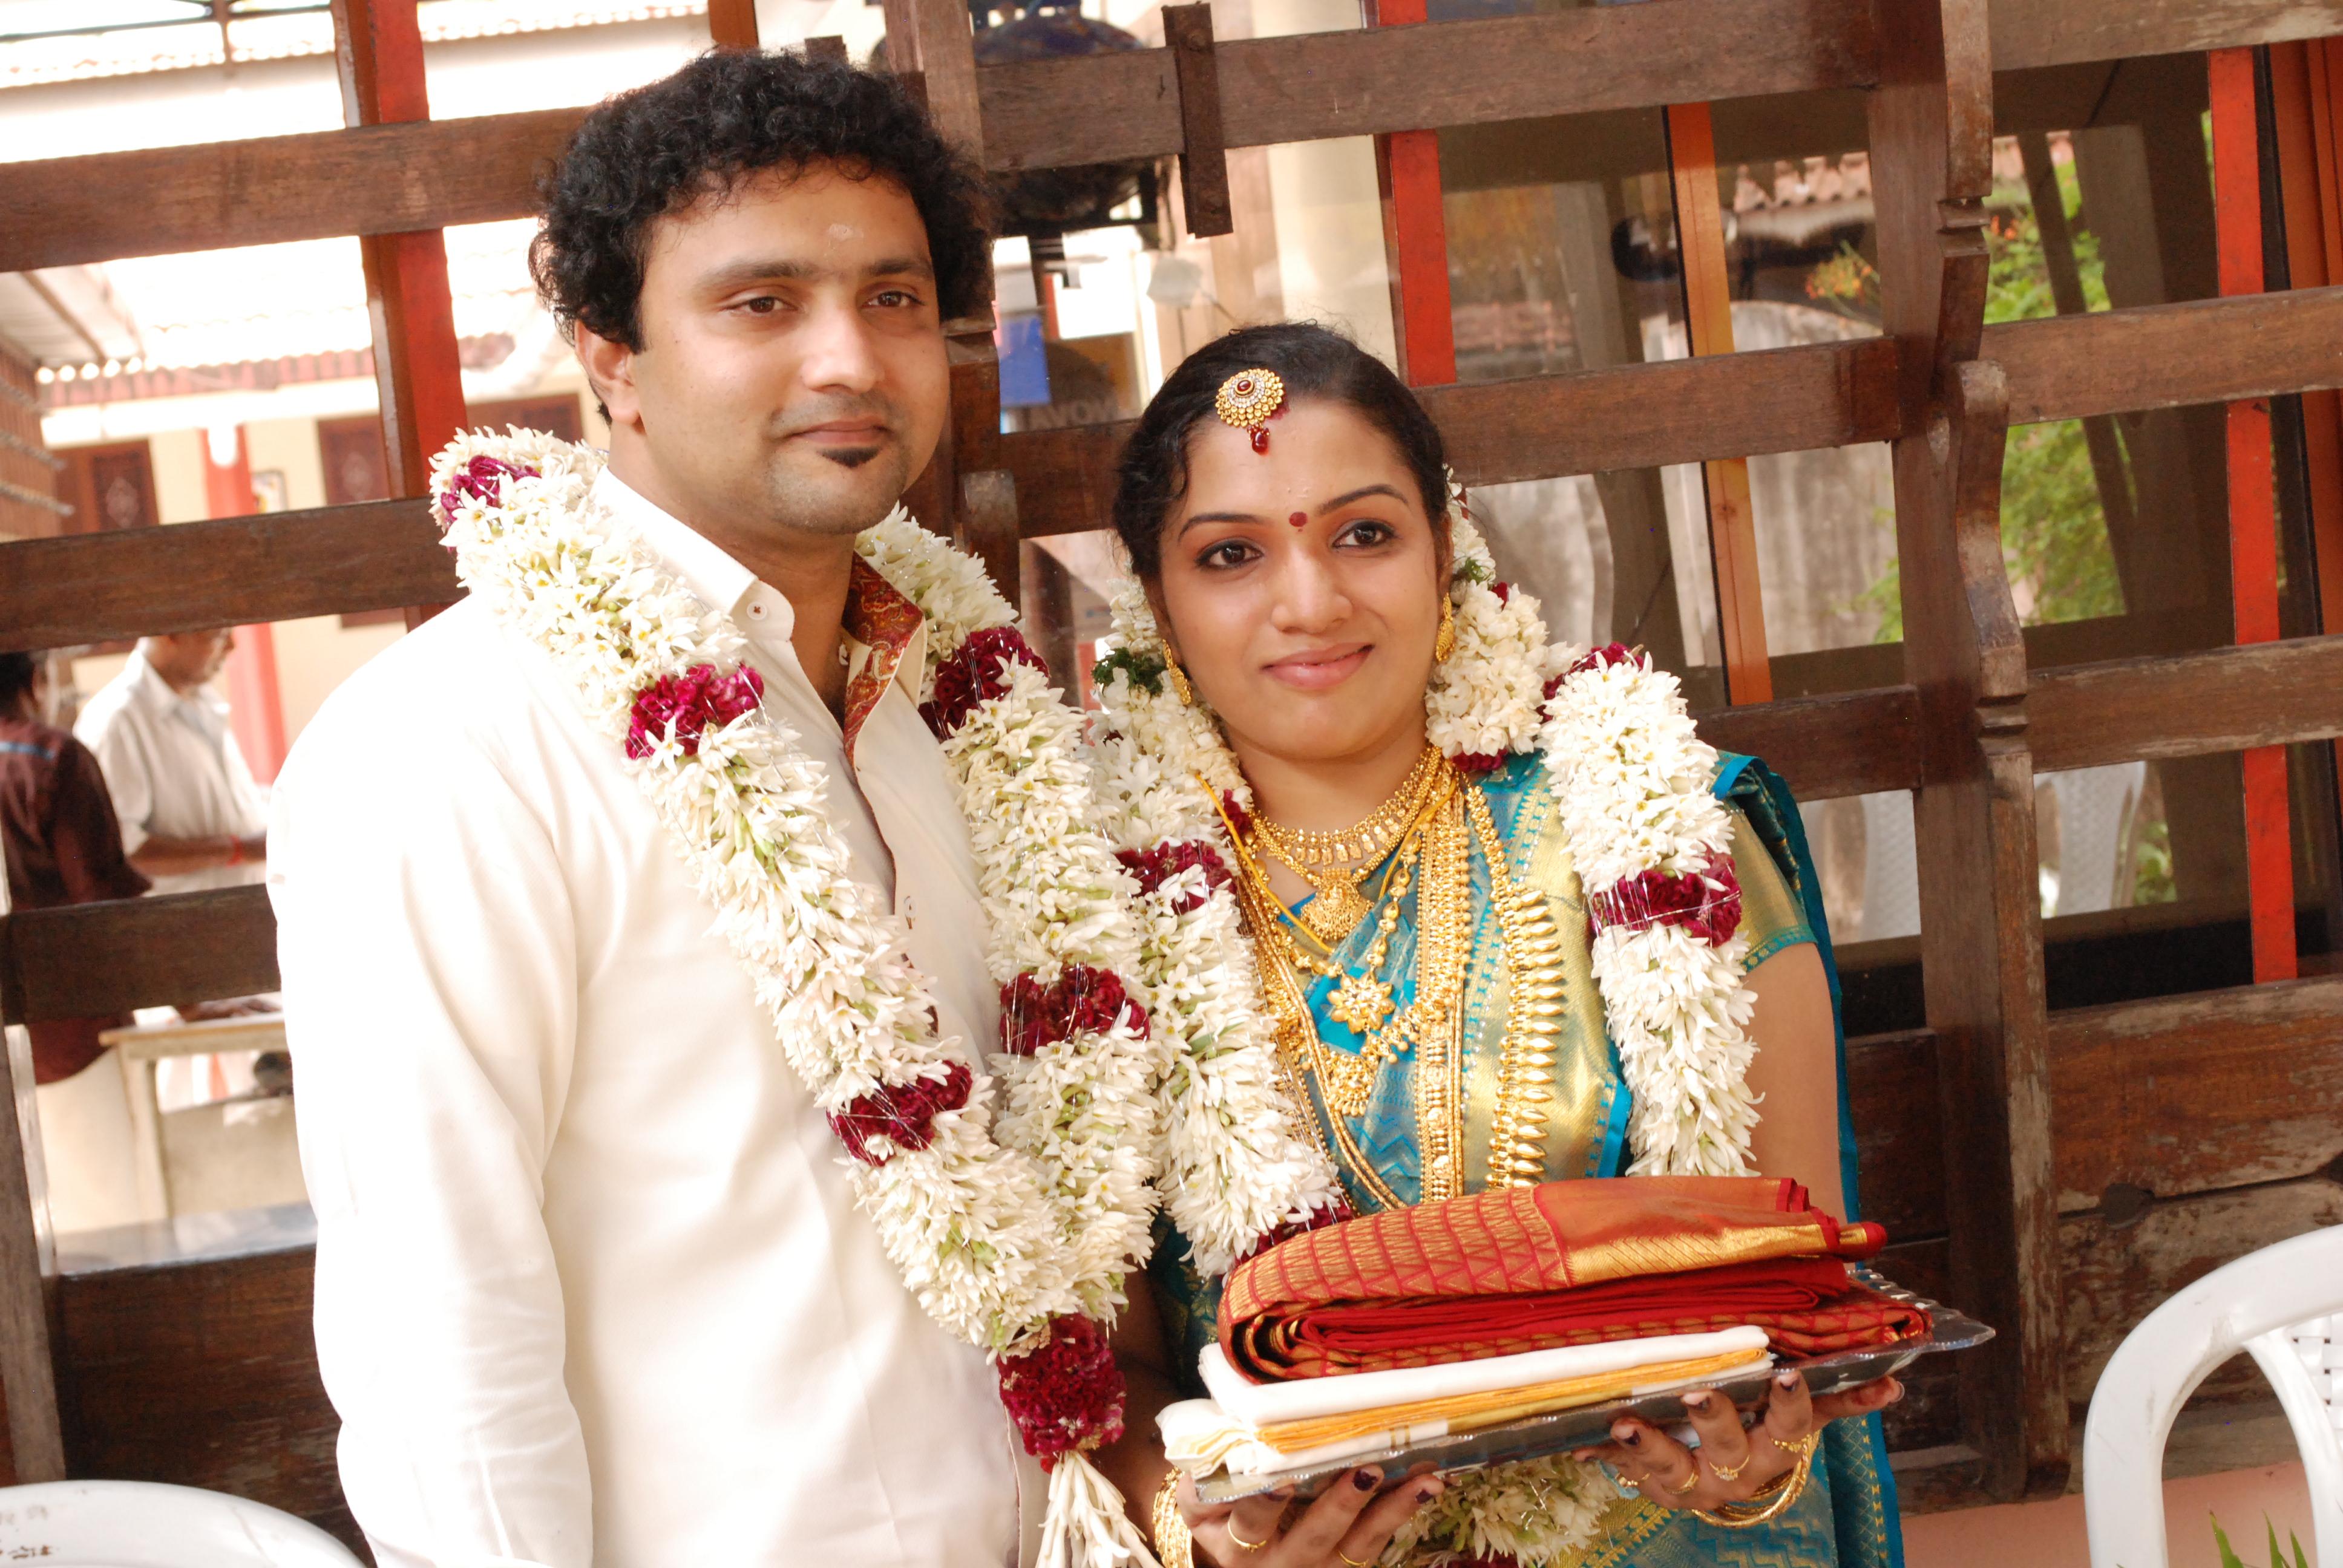 Ślub w Indiach